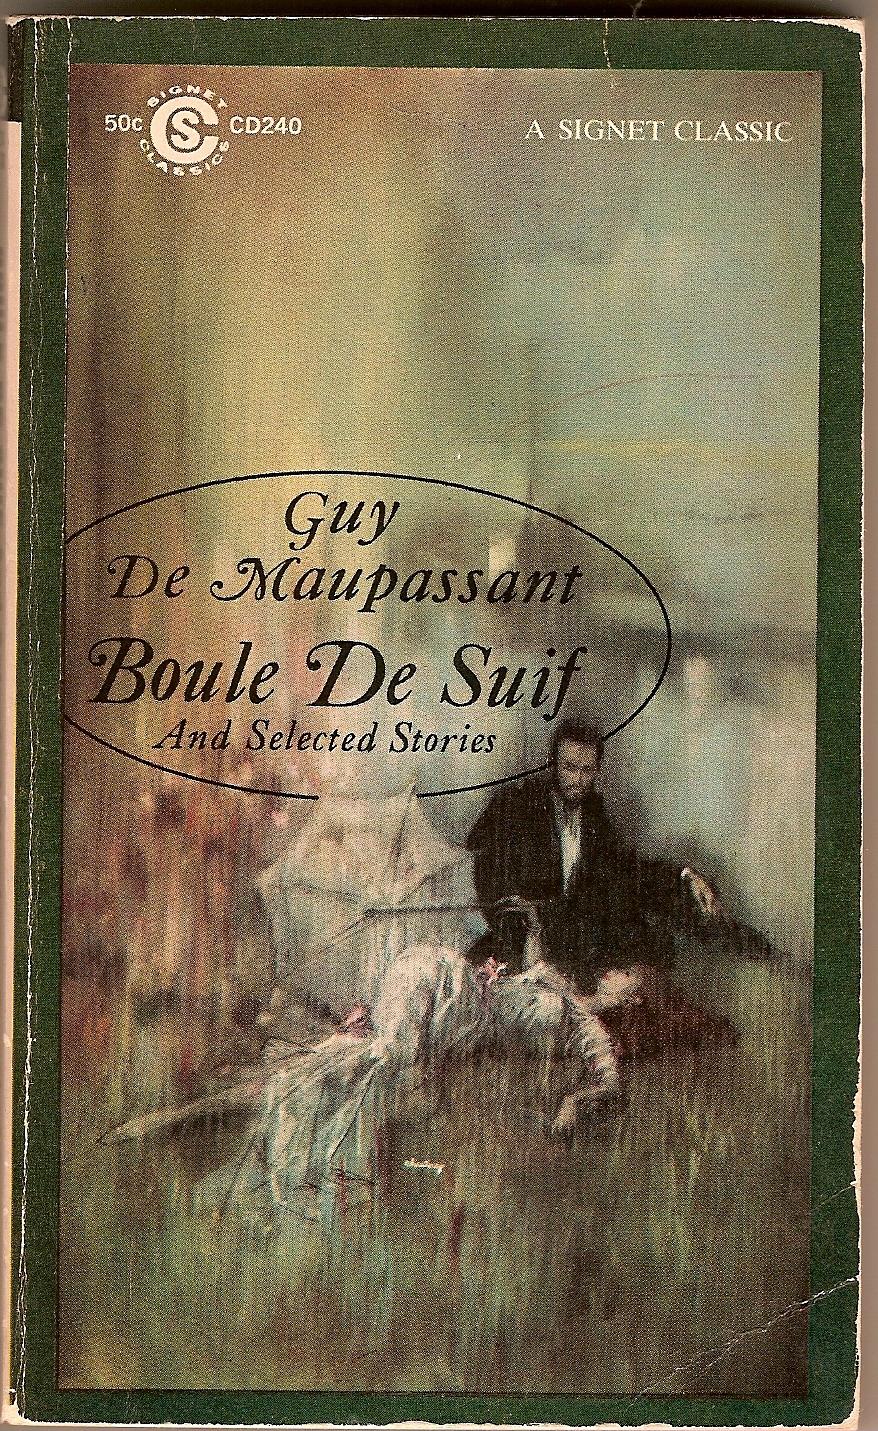 Boule de Suif and other stories